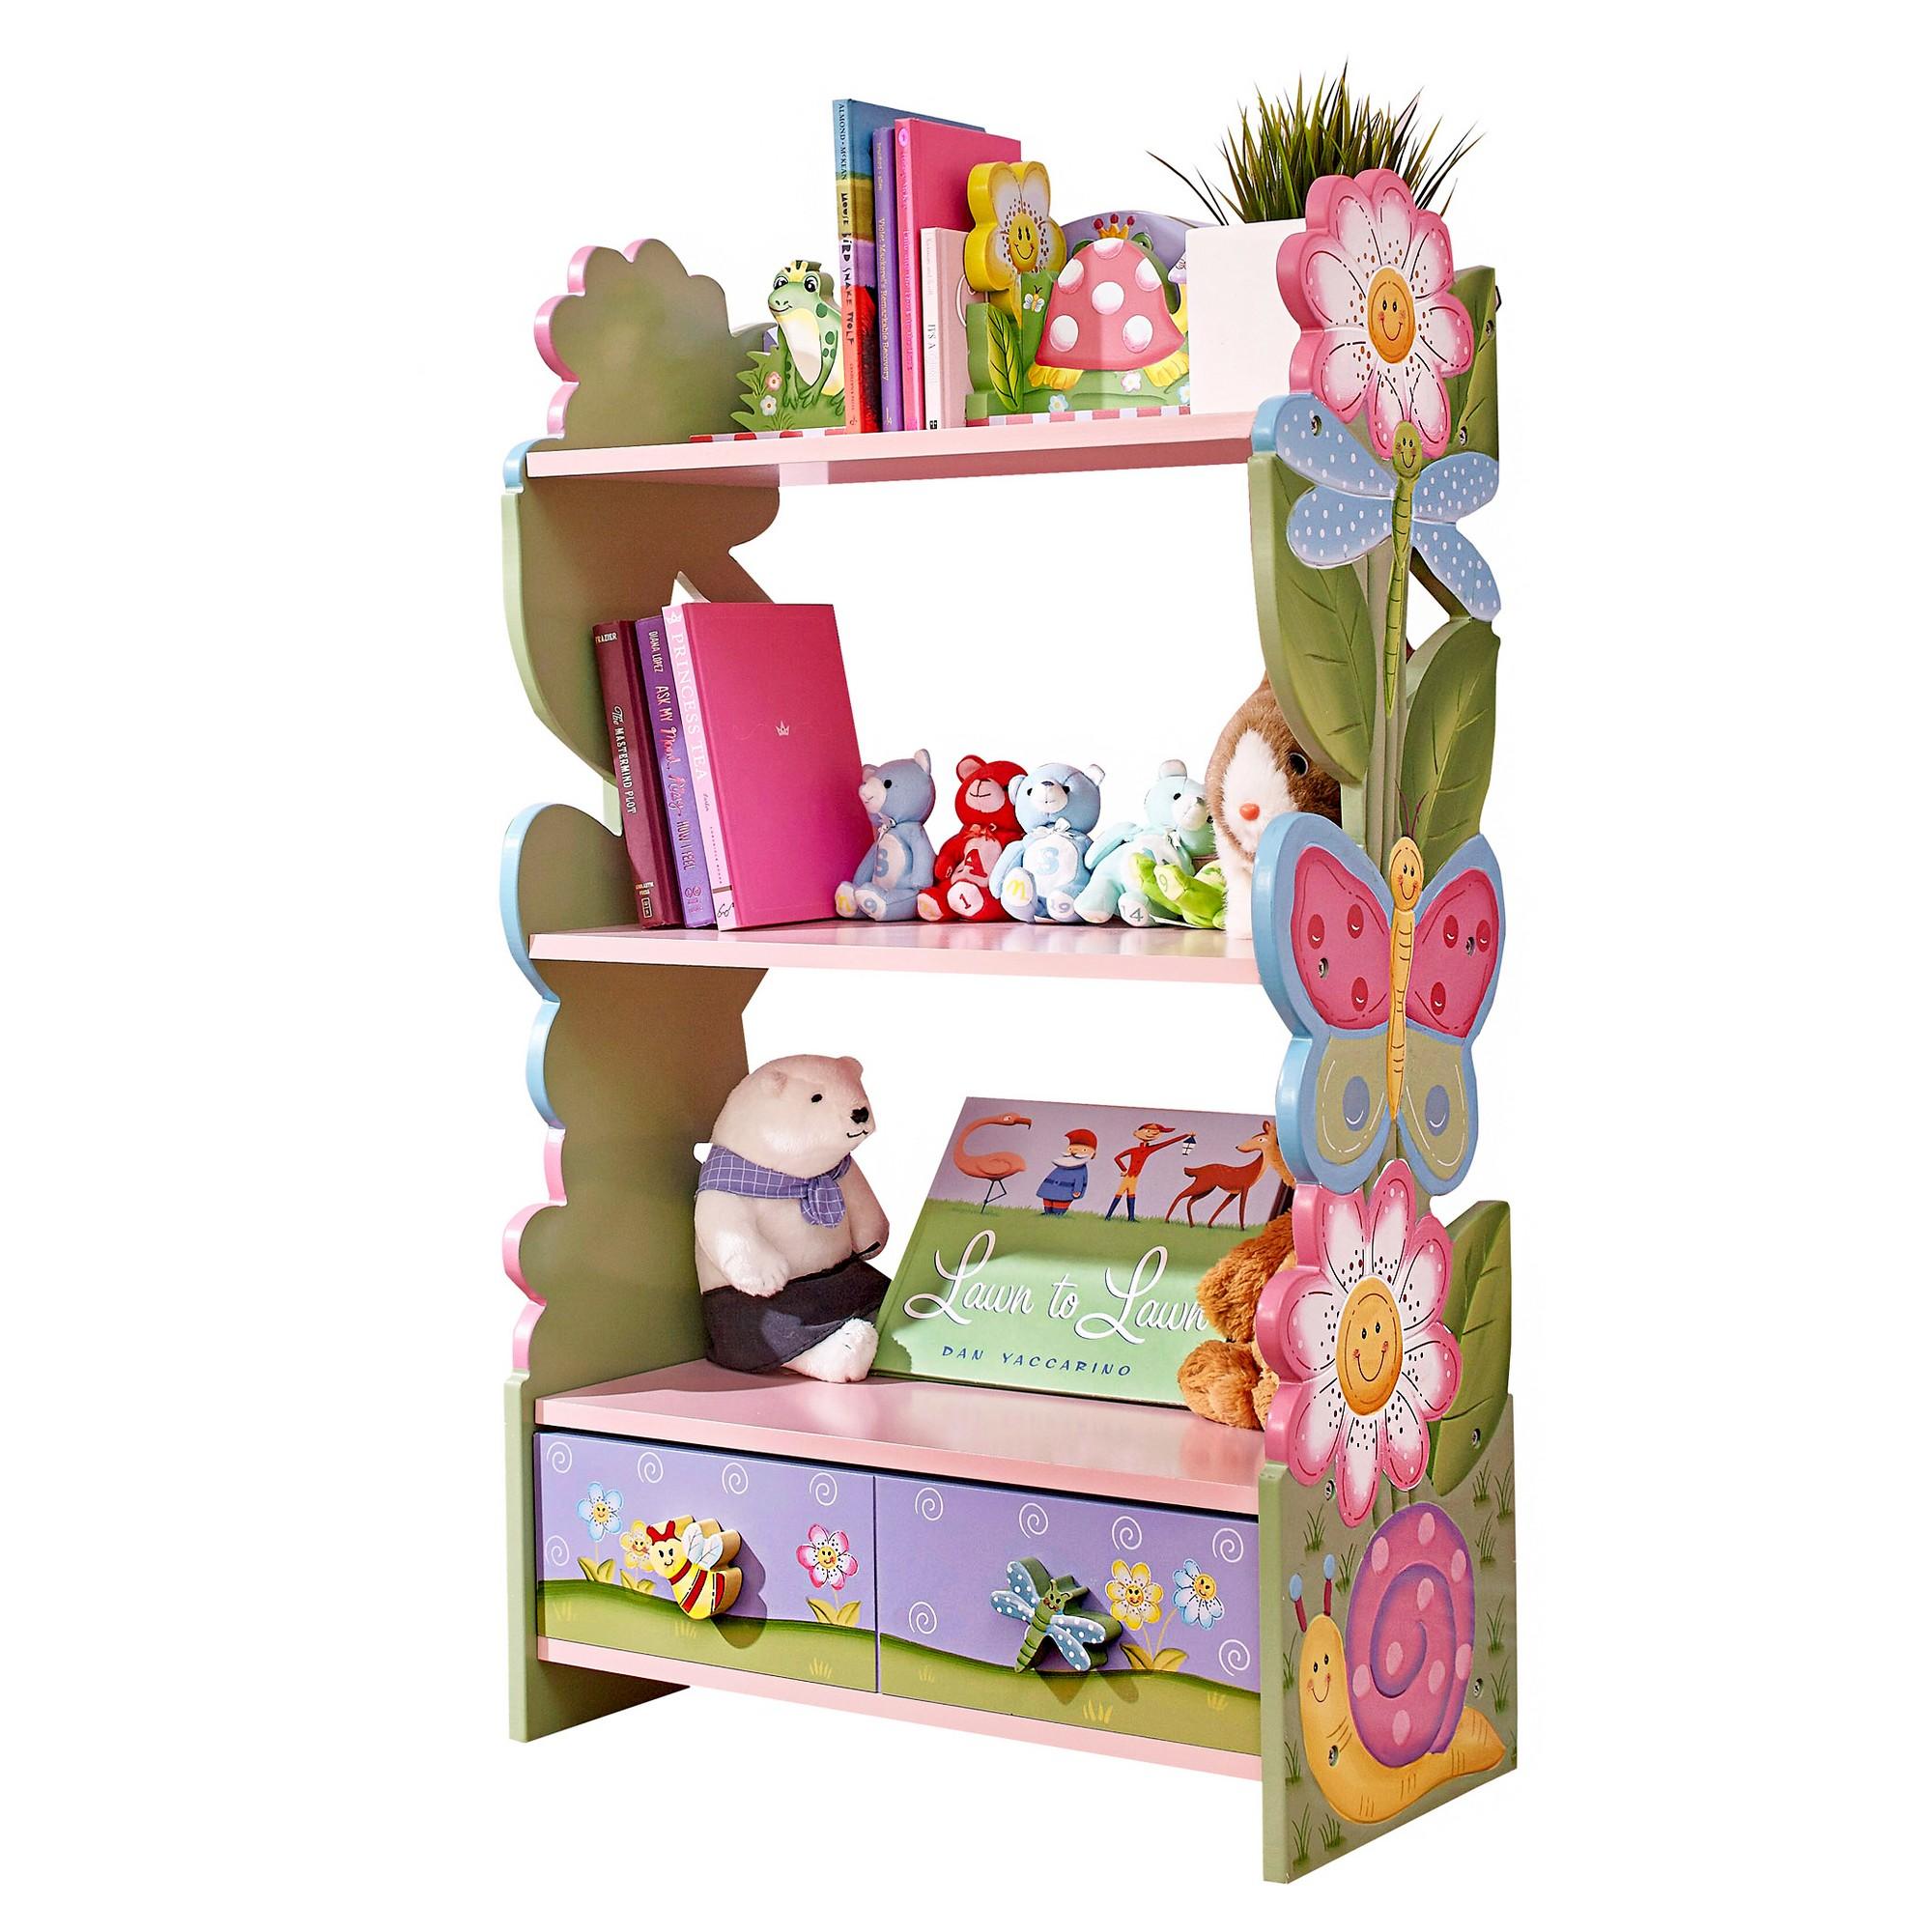 Magic Garden Kids Bookshelf With Hand Crafted Designs Fantasy Fields Bookshelves Kids Girls Bedroom Furniture Kids Furniture